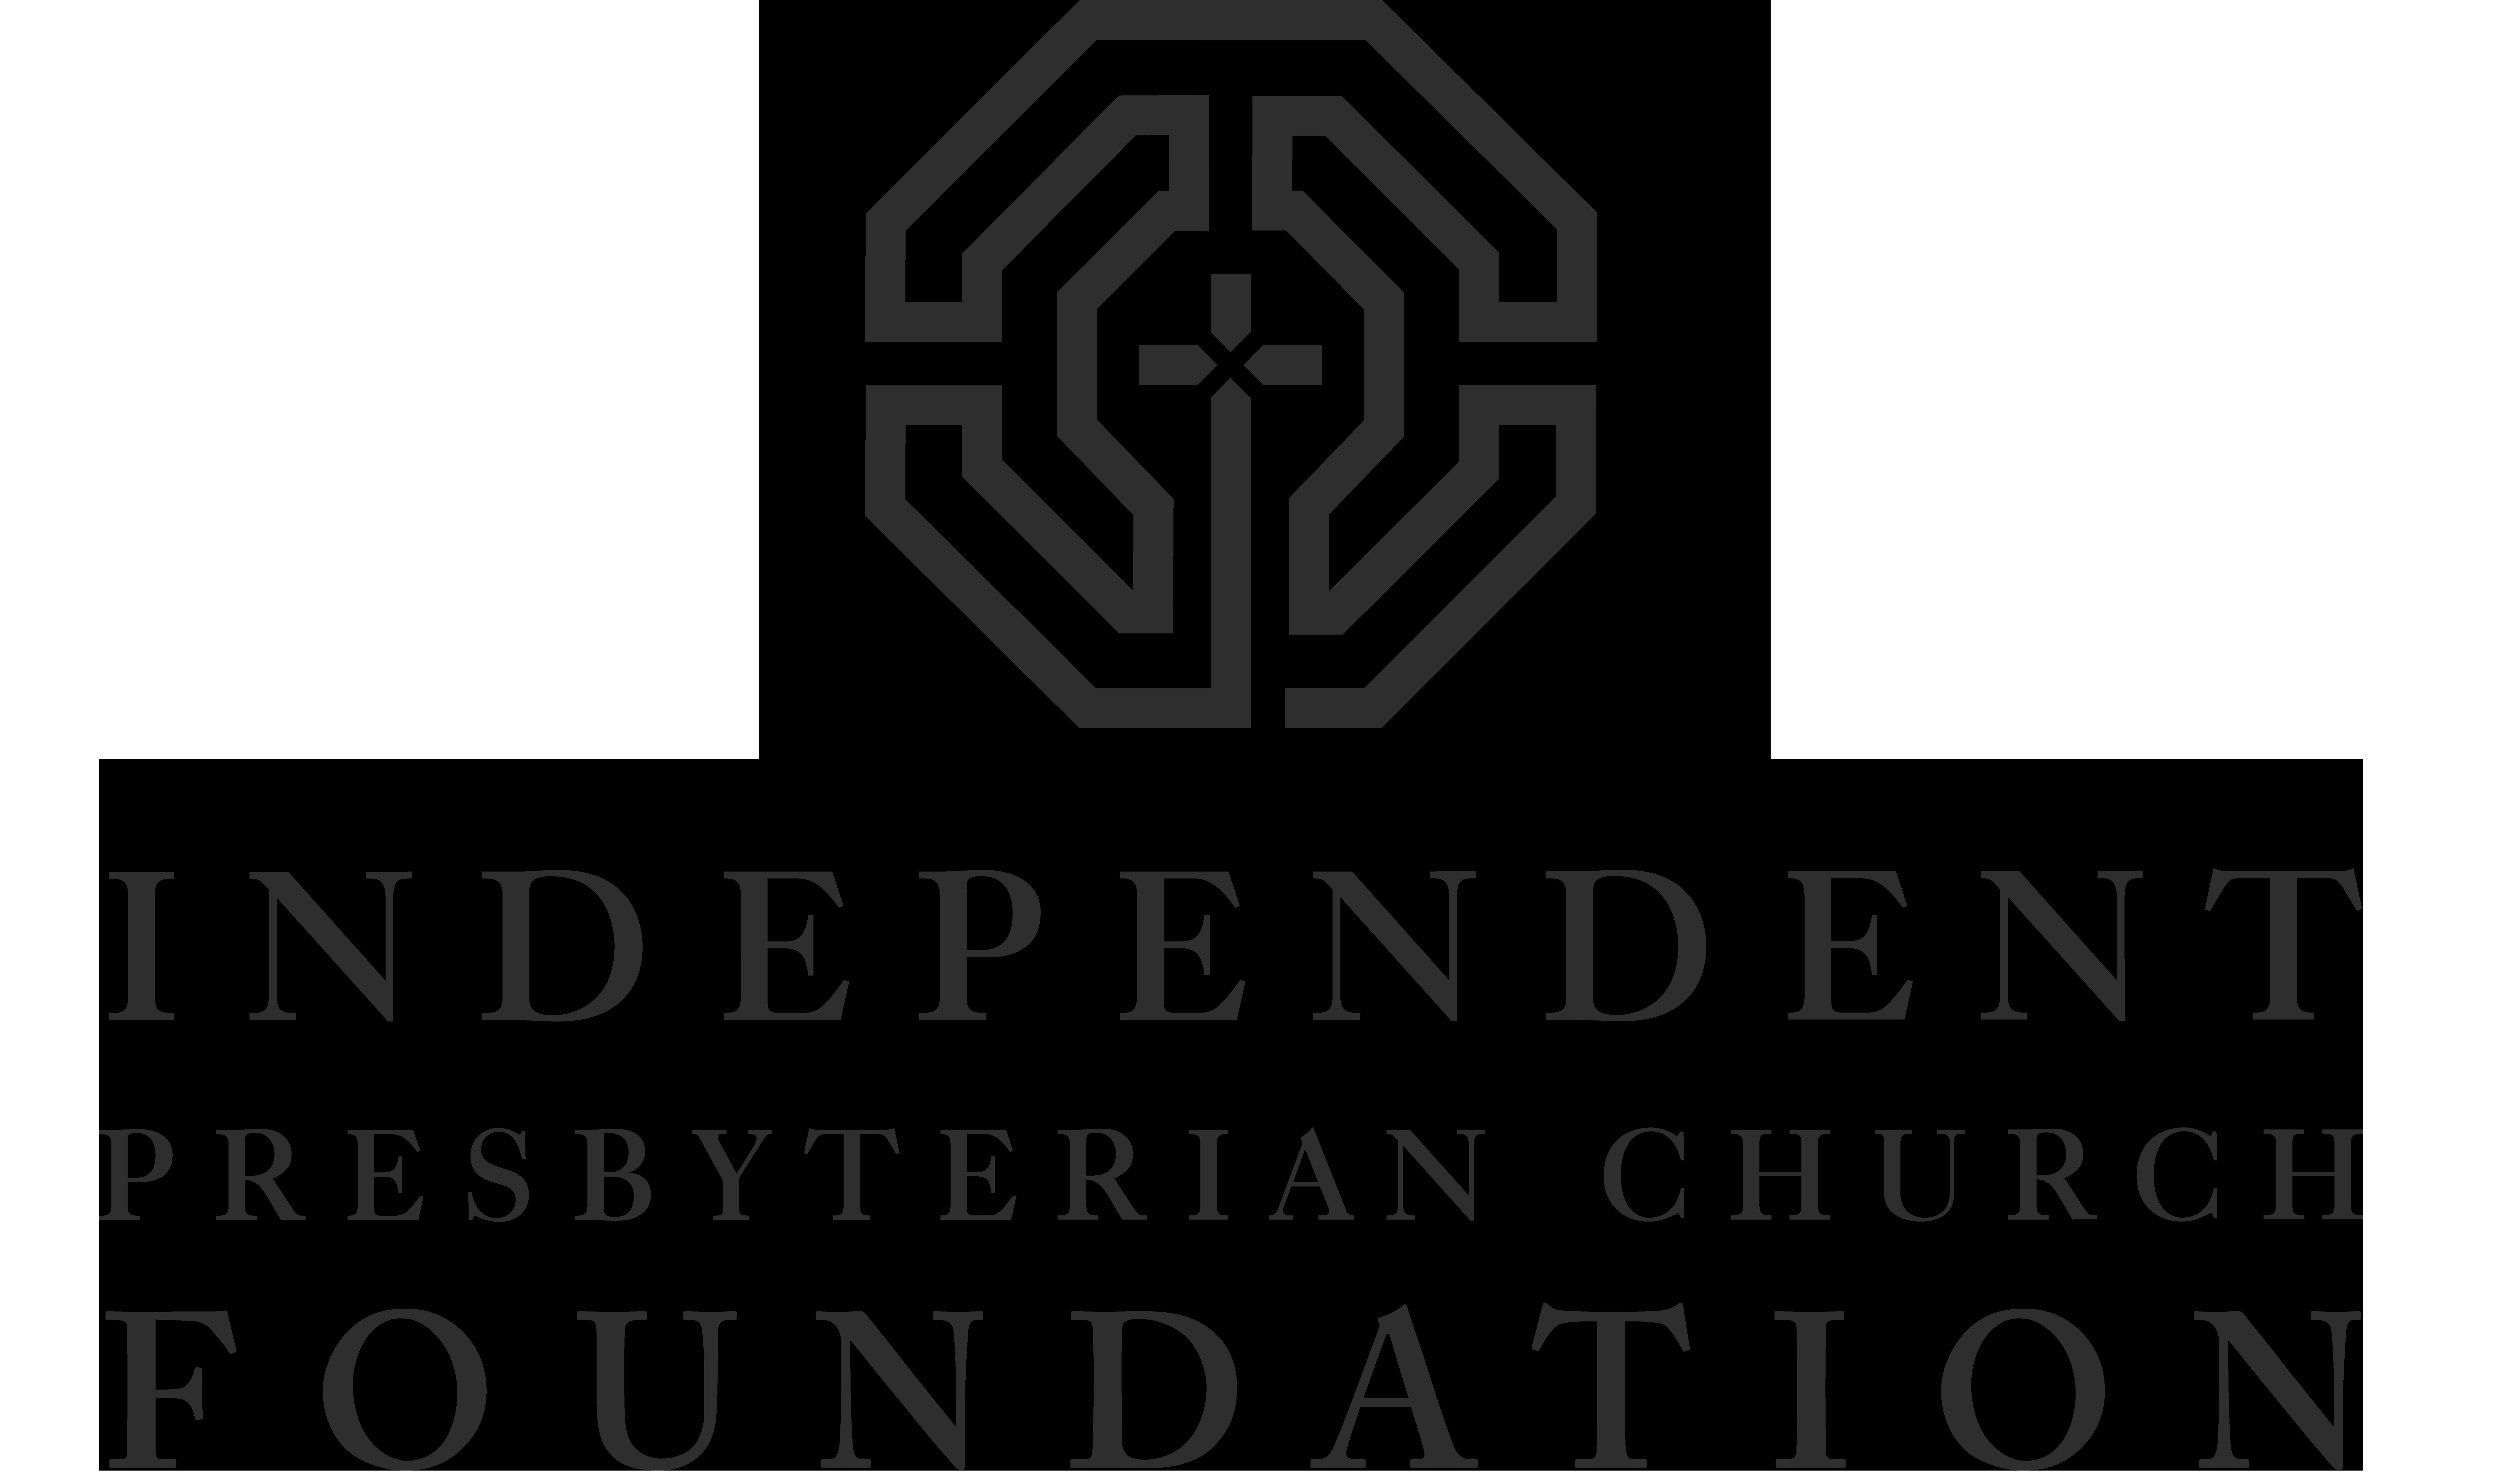 Independent Presbyterian Church Foundation